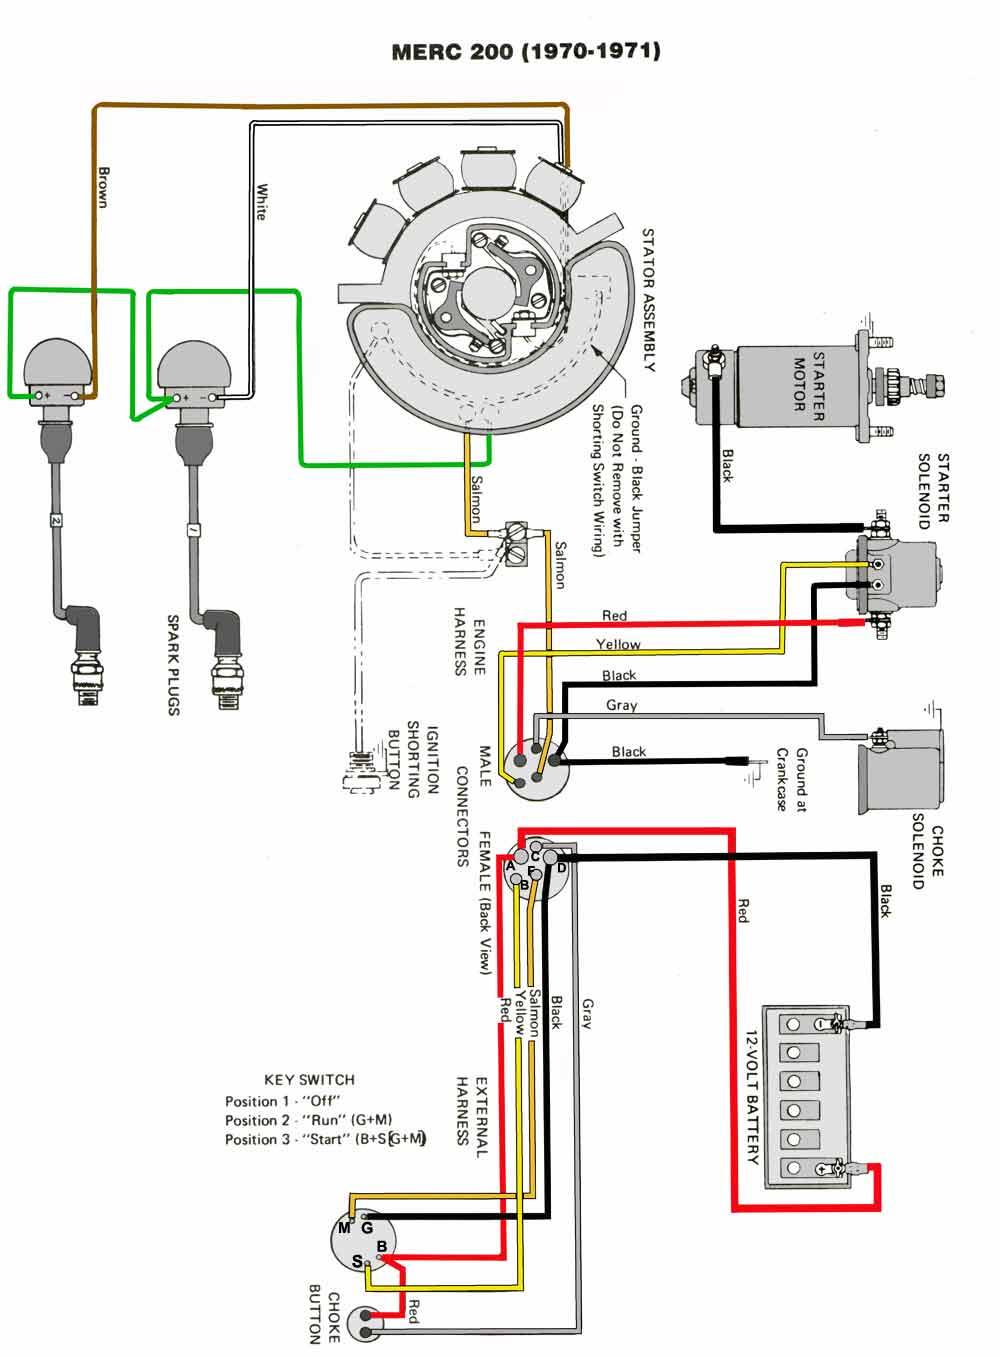 YA_8686] 1968 Evinrude 55 Hp Wiring Diagram Free Picture Wiring Diagram  Download DiagramUnde Waro Exmet Minaga Winn Xortanet Salv Mohammedshrine Librar Wiring 101